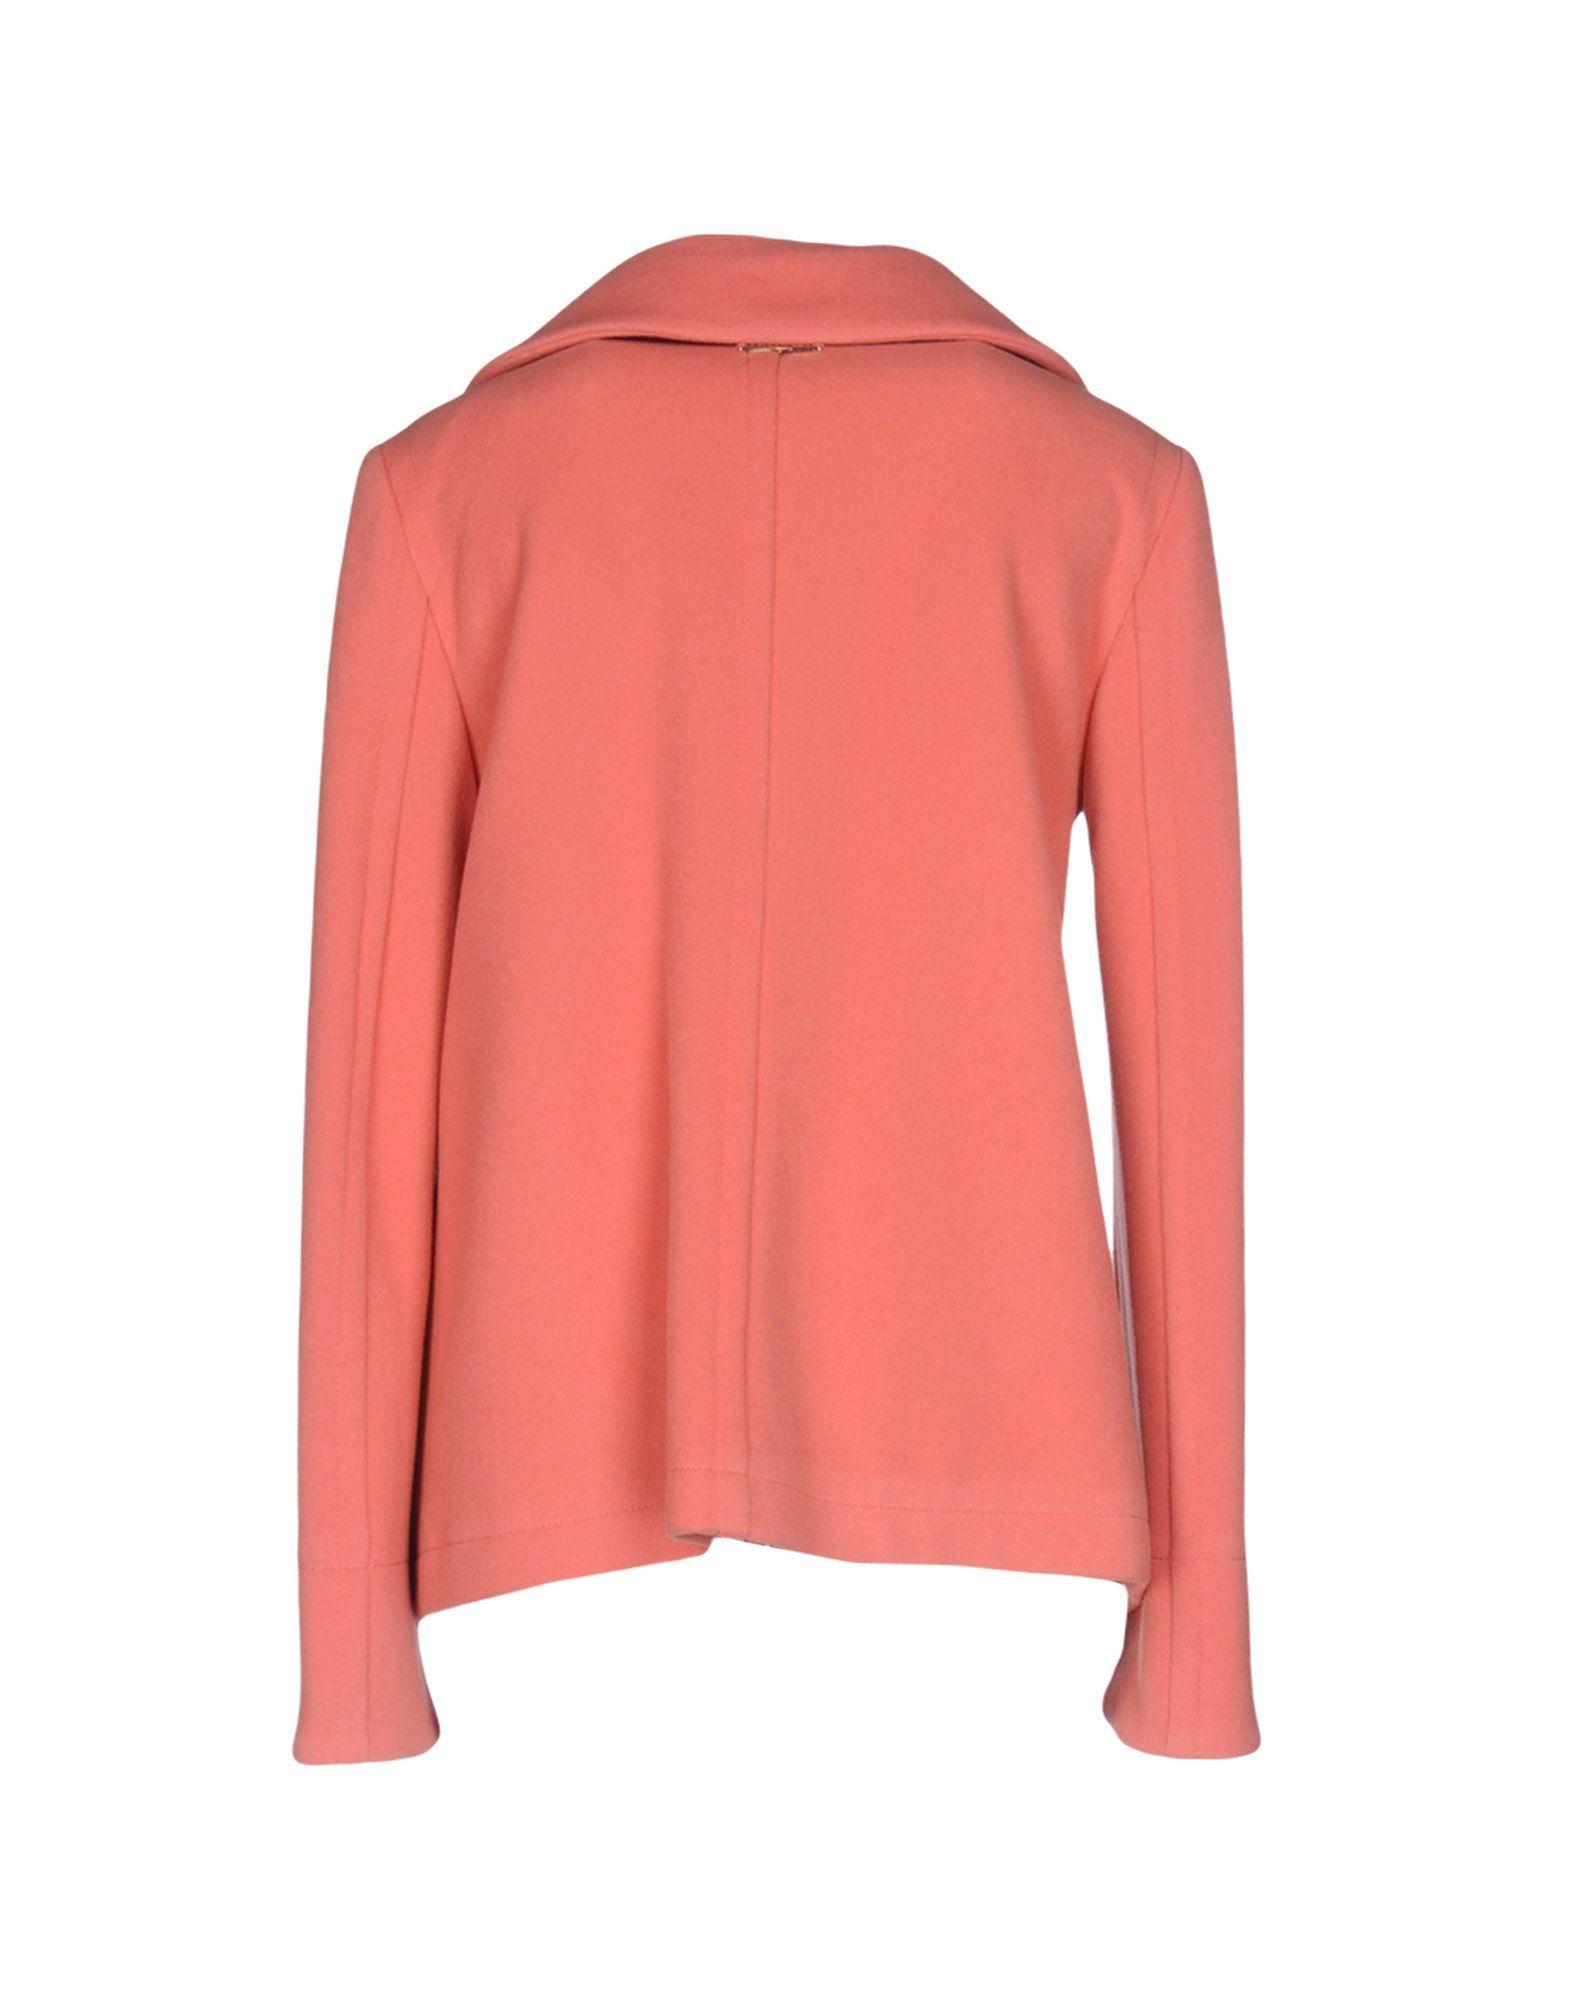 Twinset Salmon Pink Virgin Wool Jacket